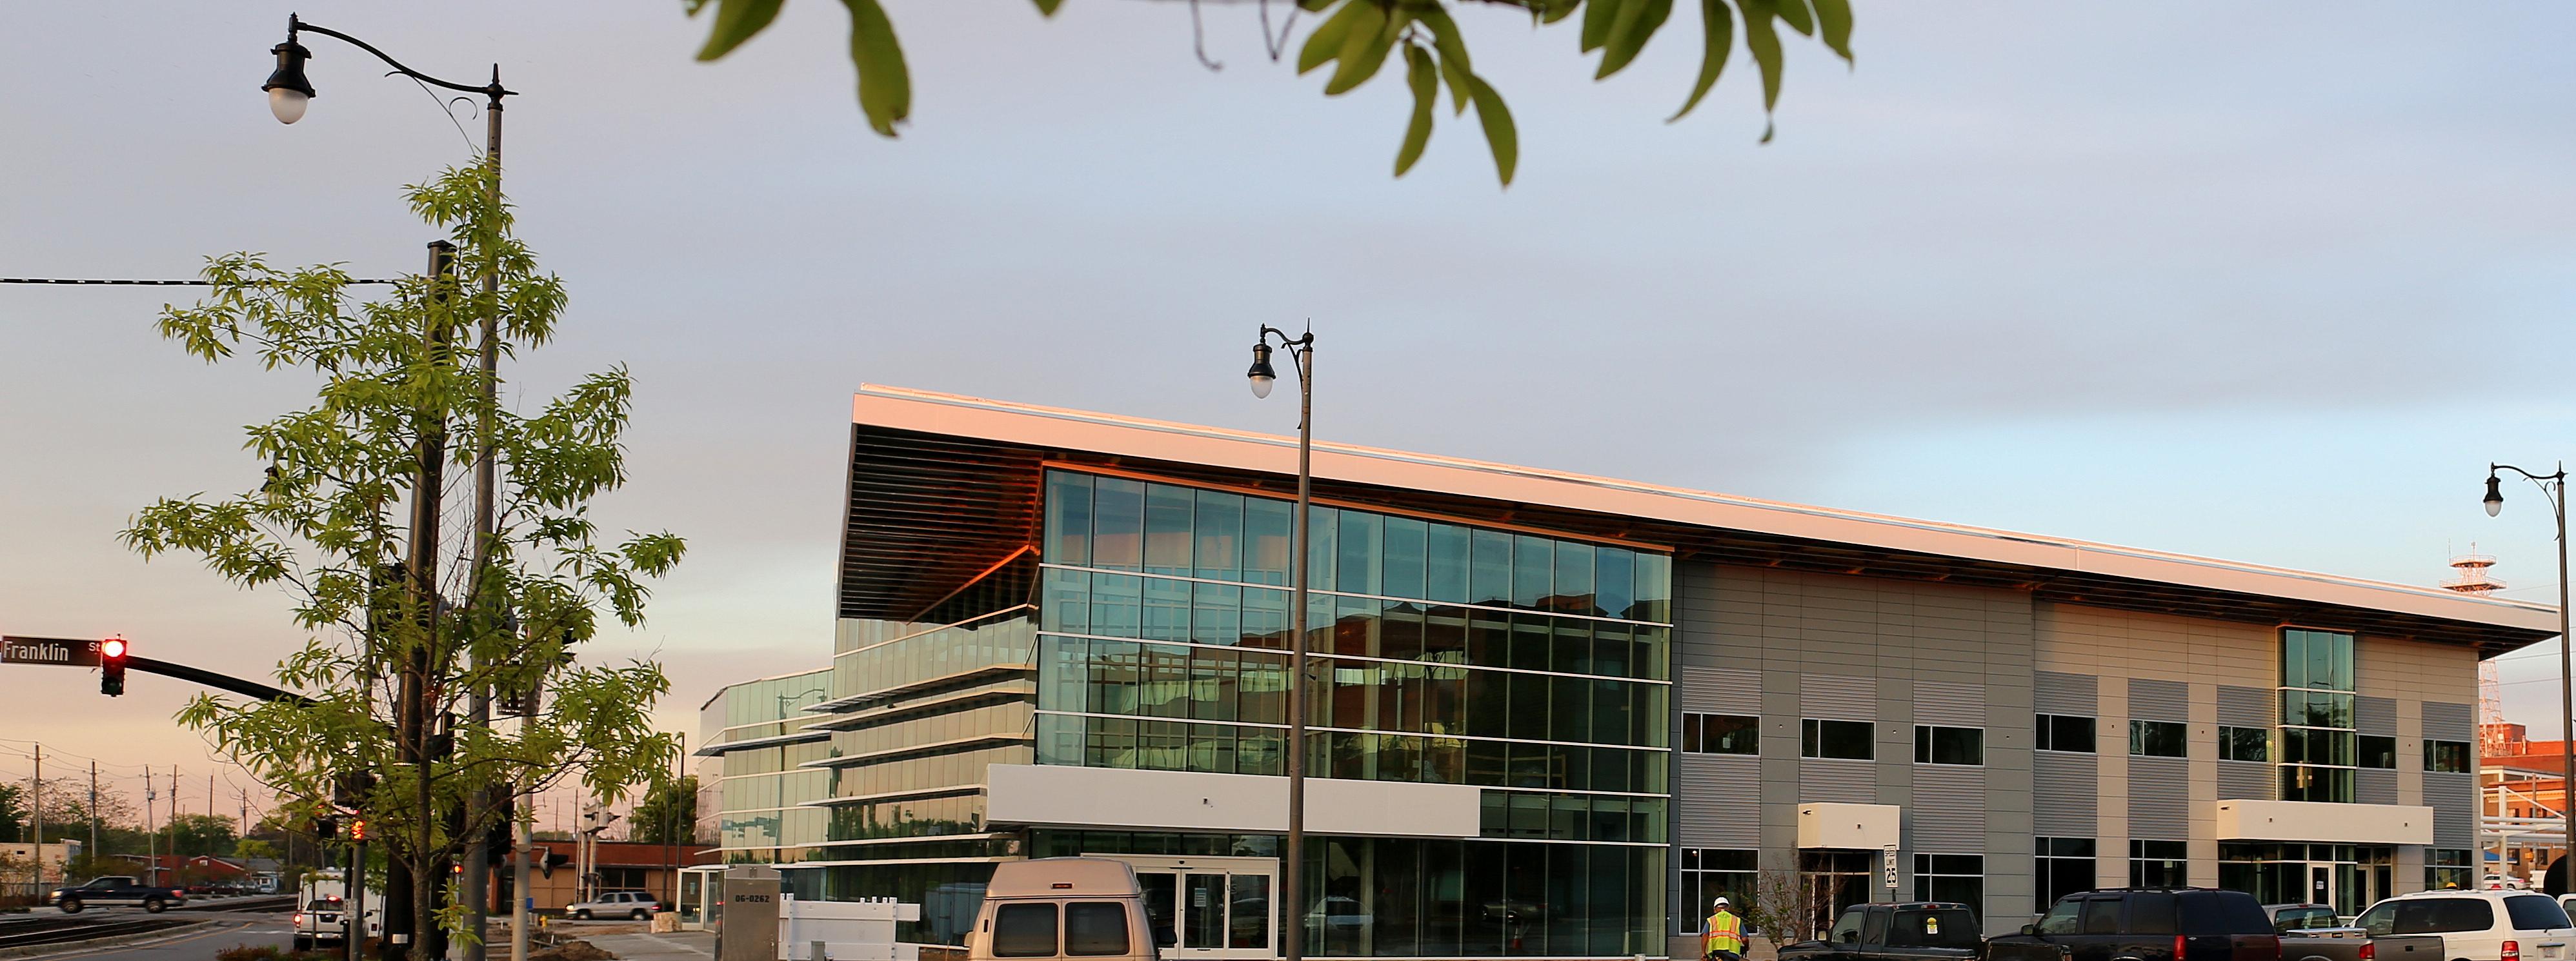 Place ~ Fayetteville, NC–Transportation Hub, 04/11